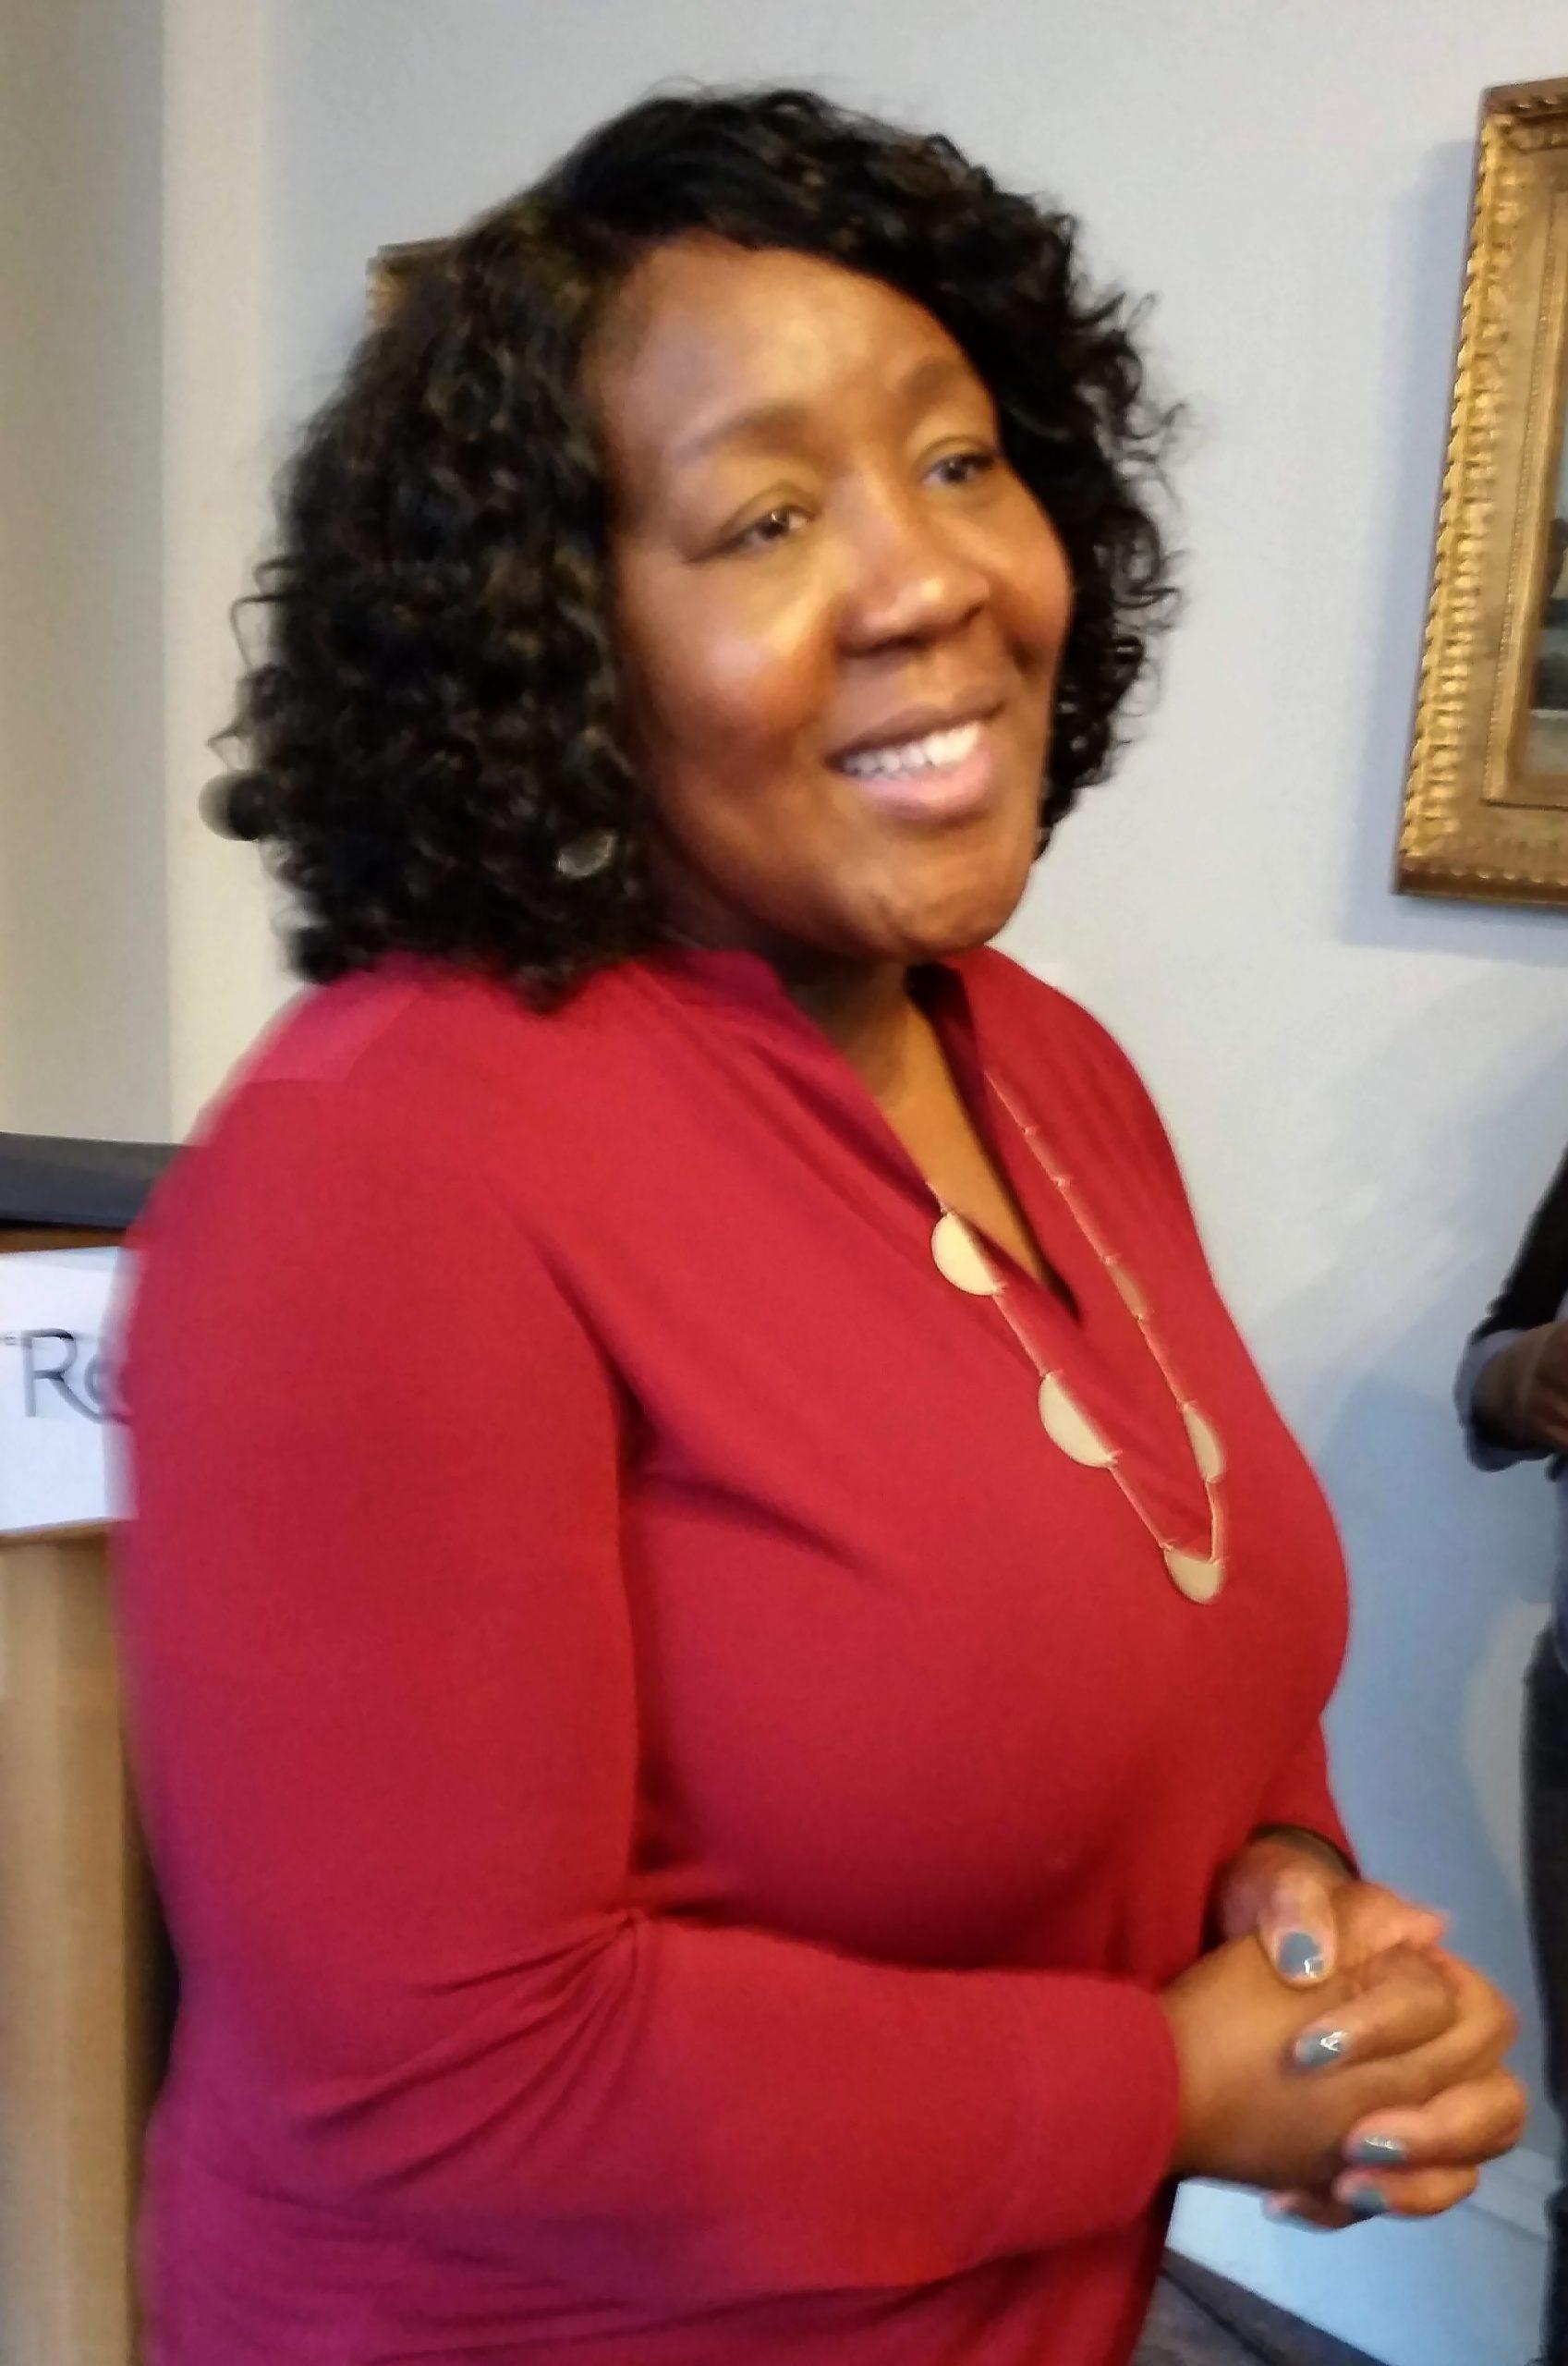 Trapeta B. Mayson, Philadelphia's Poet Laureate, speaking about Toni Morrison at The Rosenbach